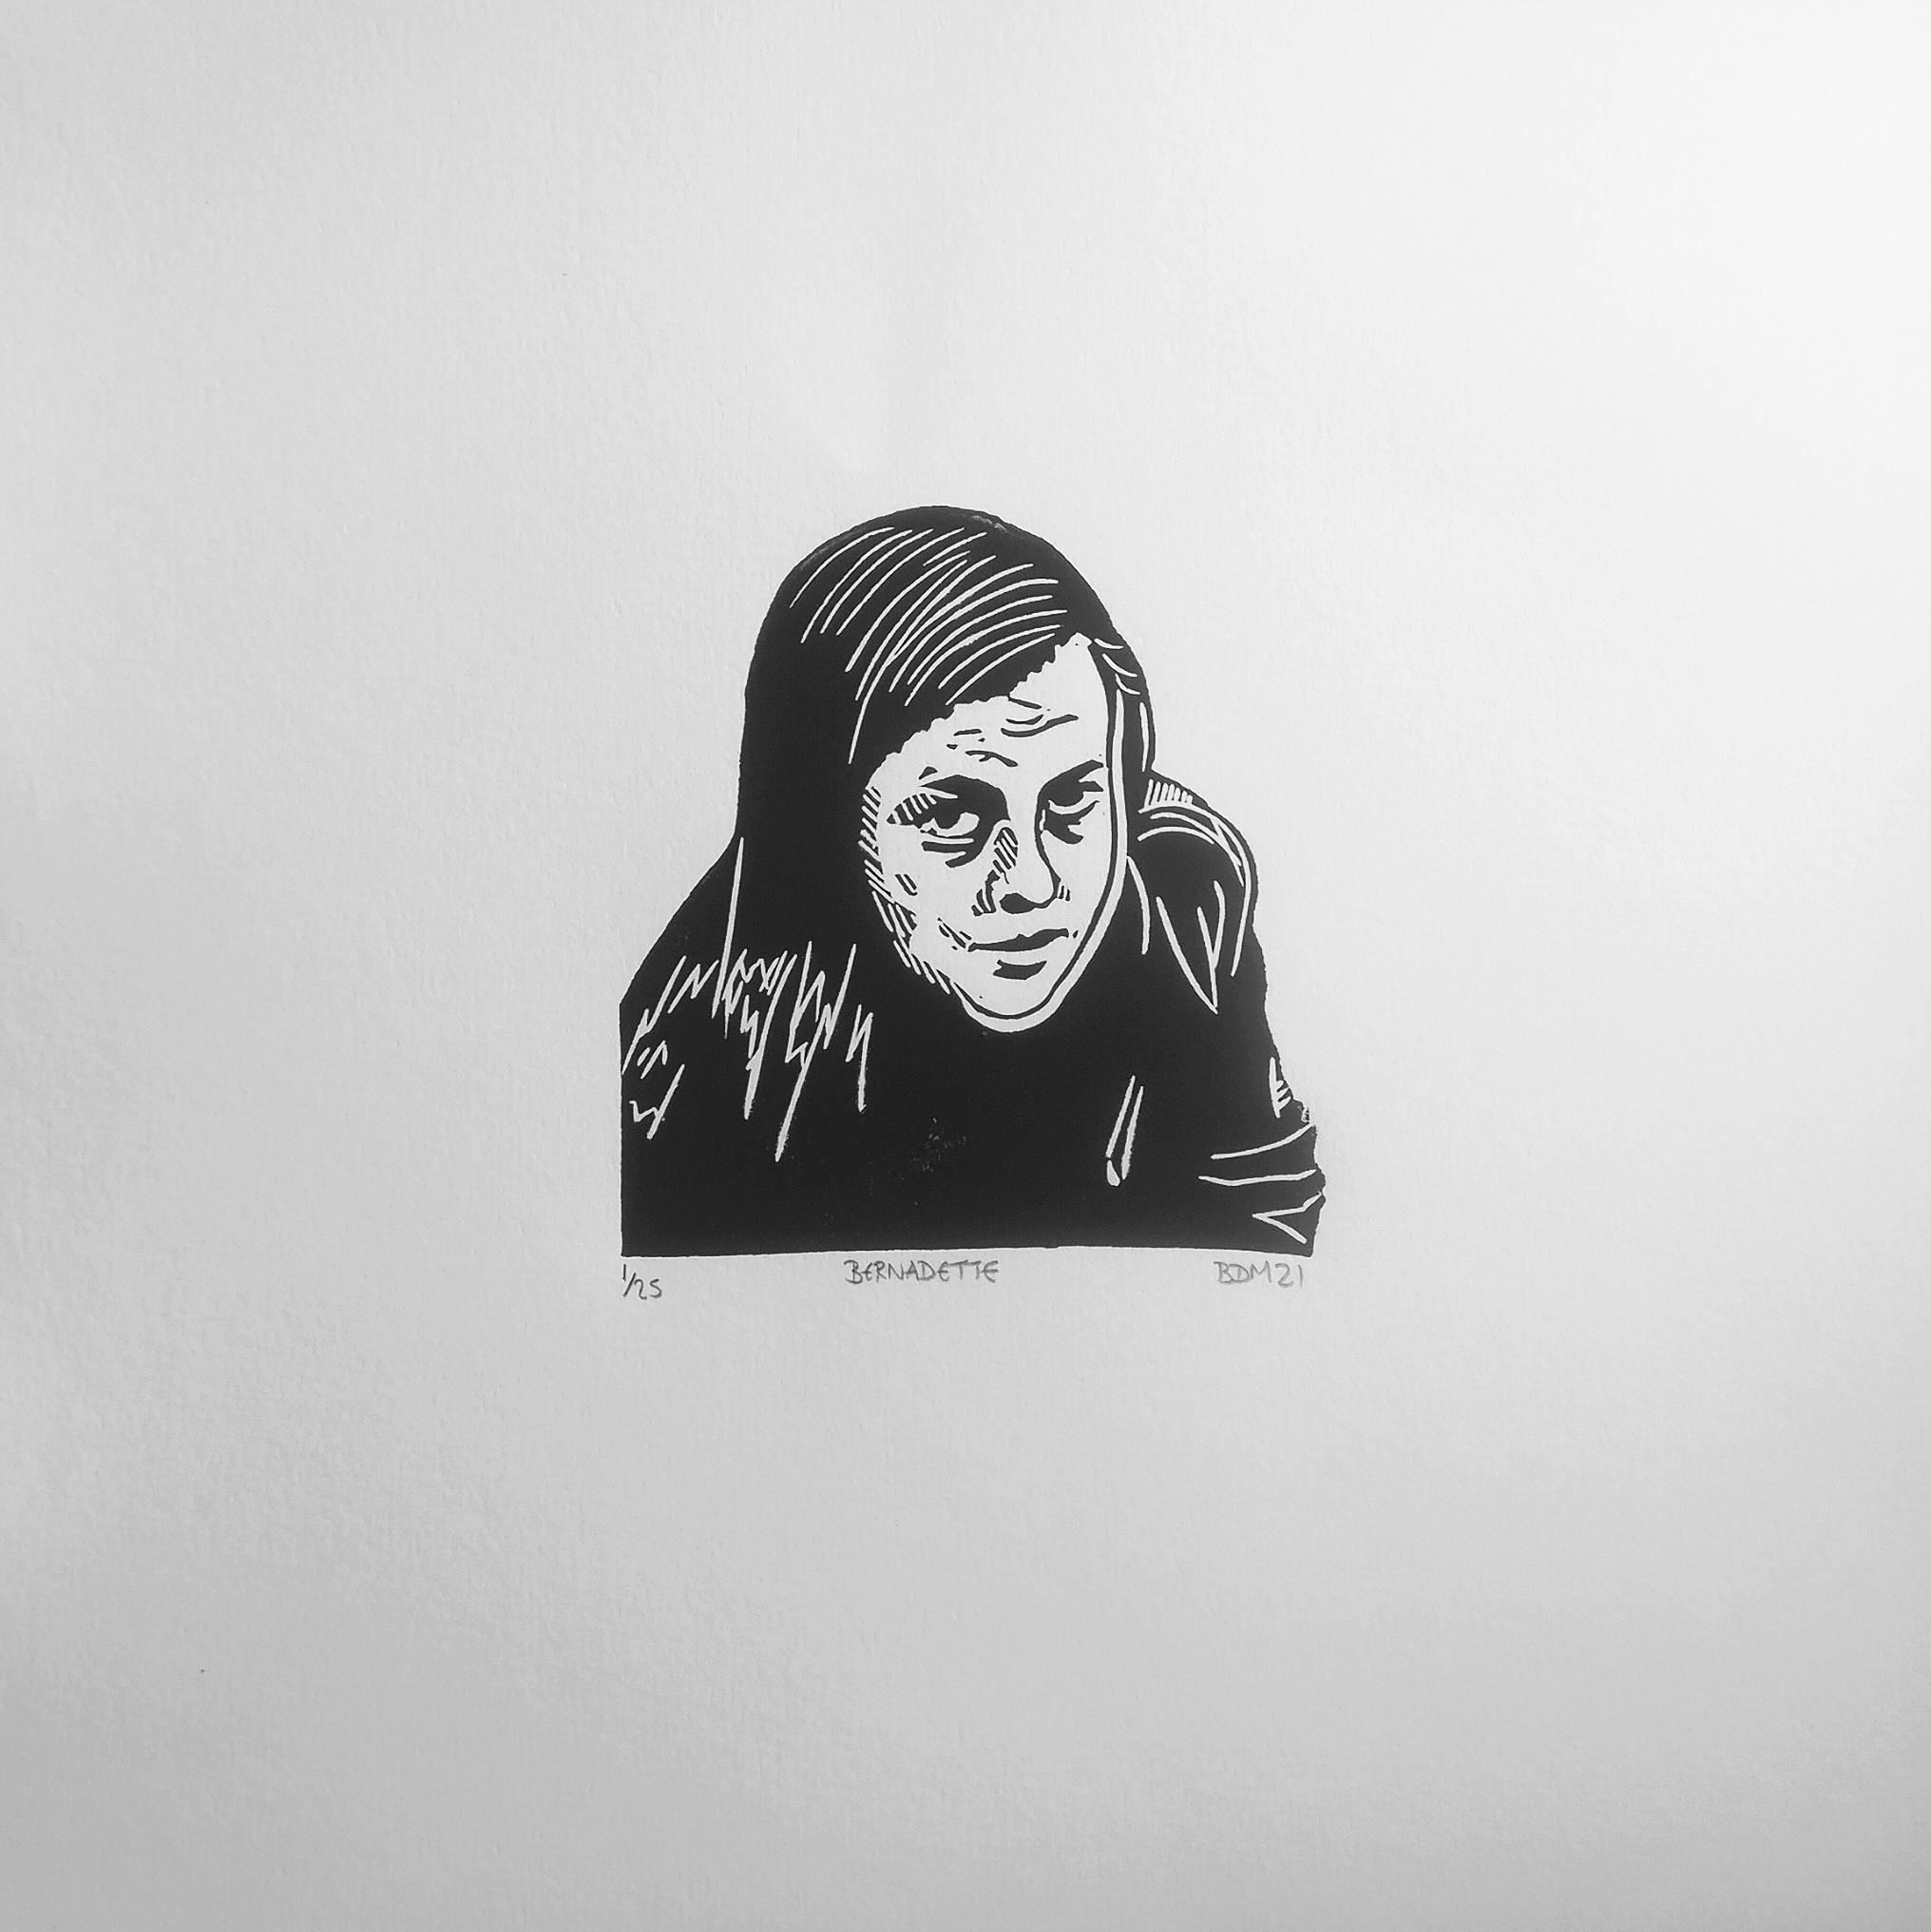 Bernadette Devlin